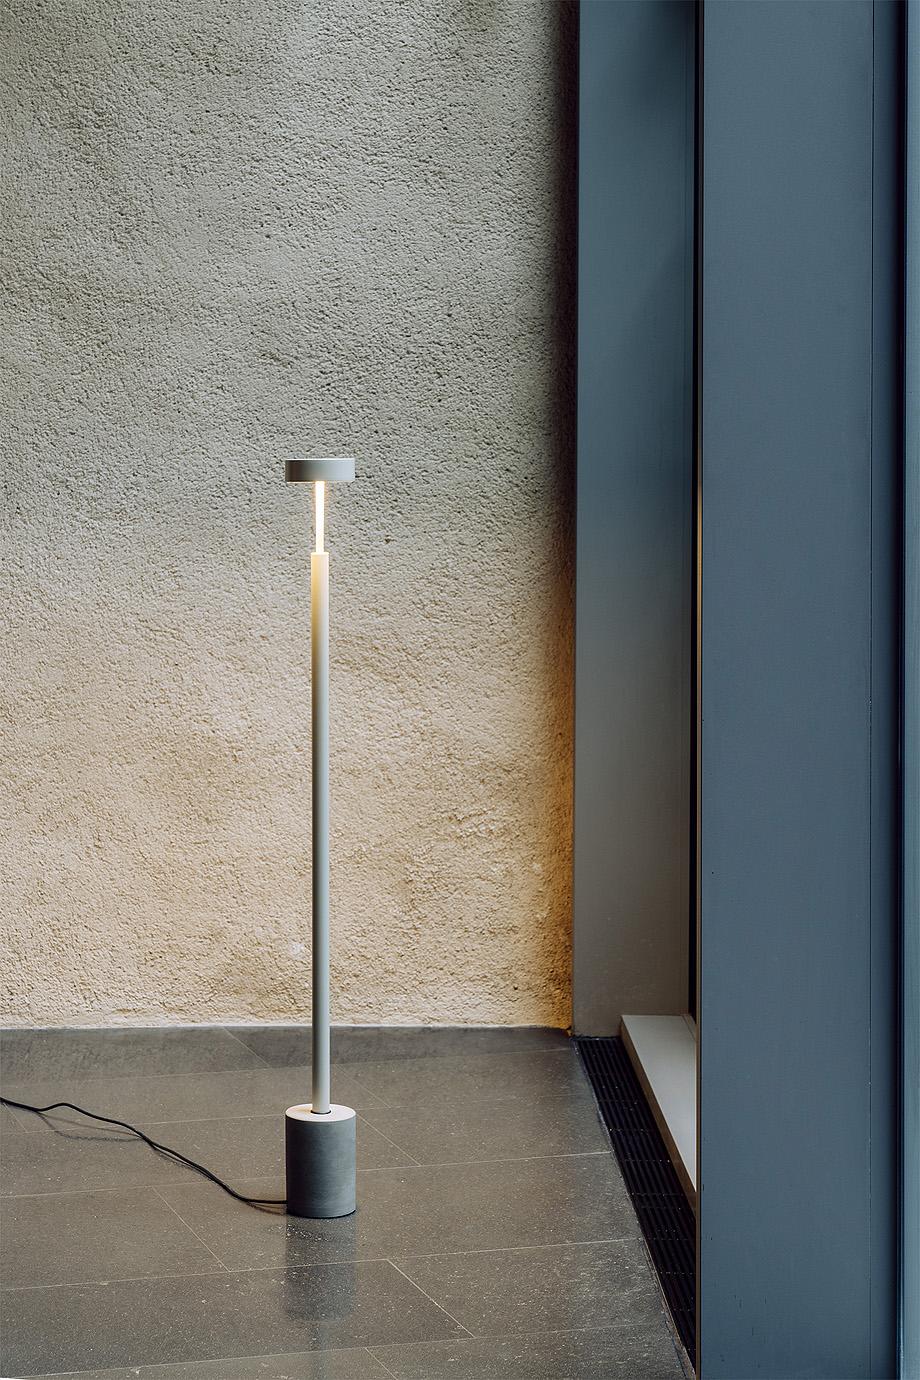 seleccion premios delta categoria iluminacion (5)